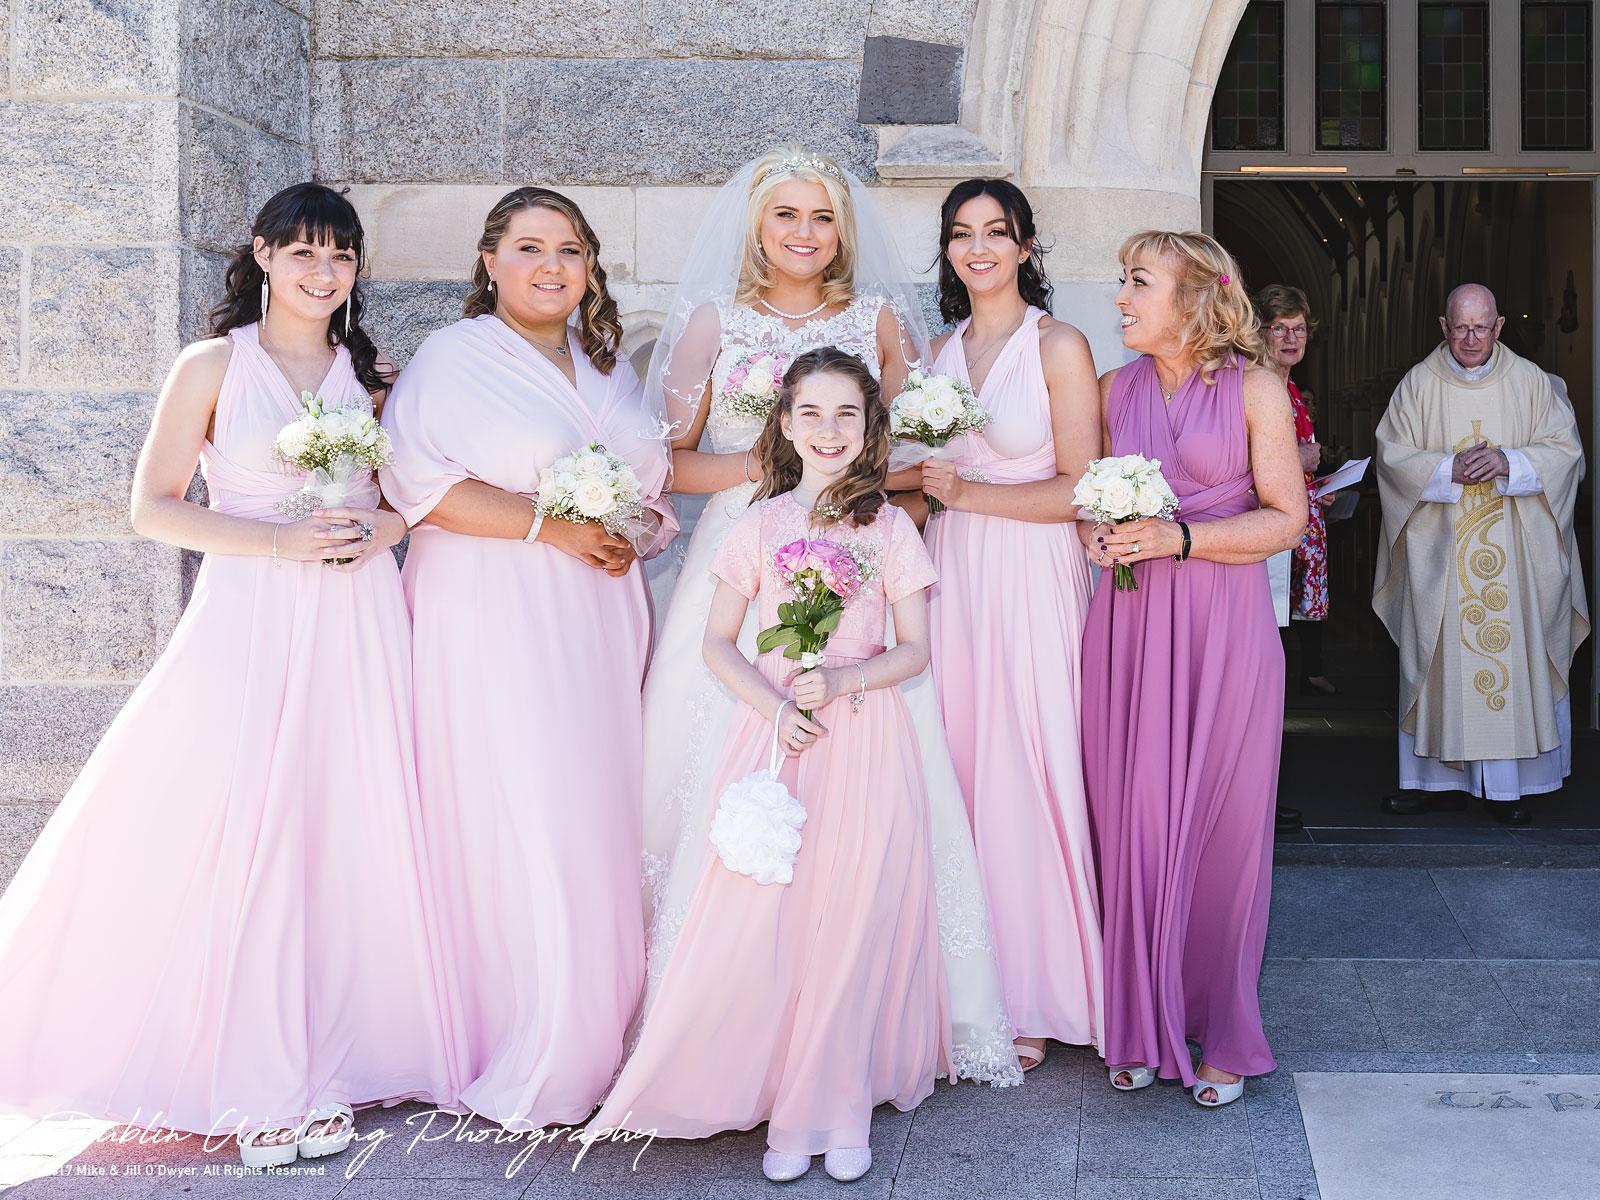 wedding-photographer-wicklow-glenview-hotel-KS017.jpg